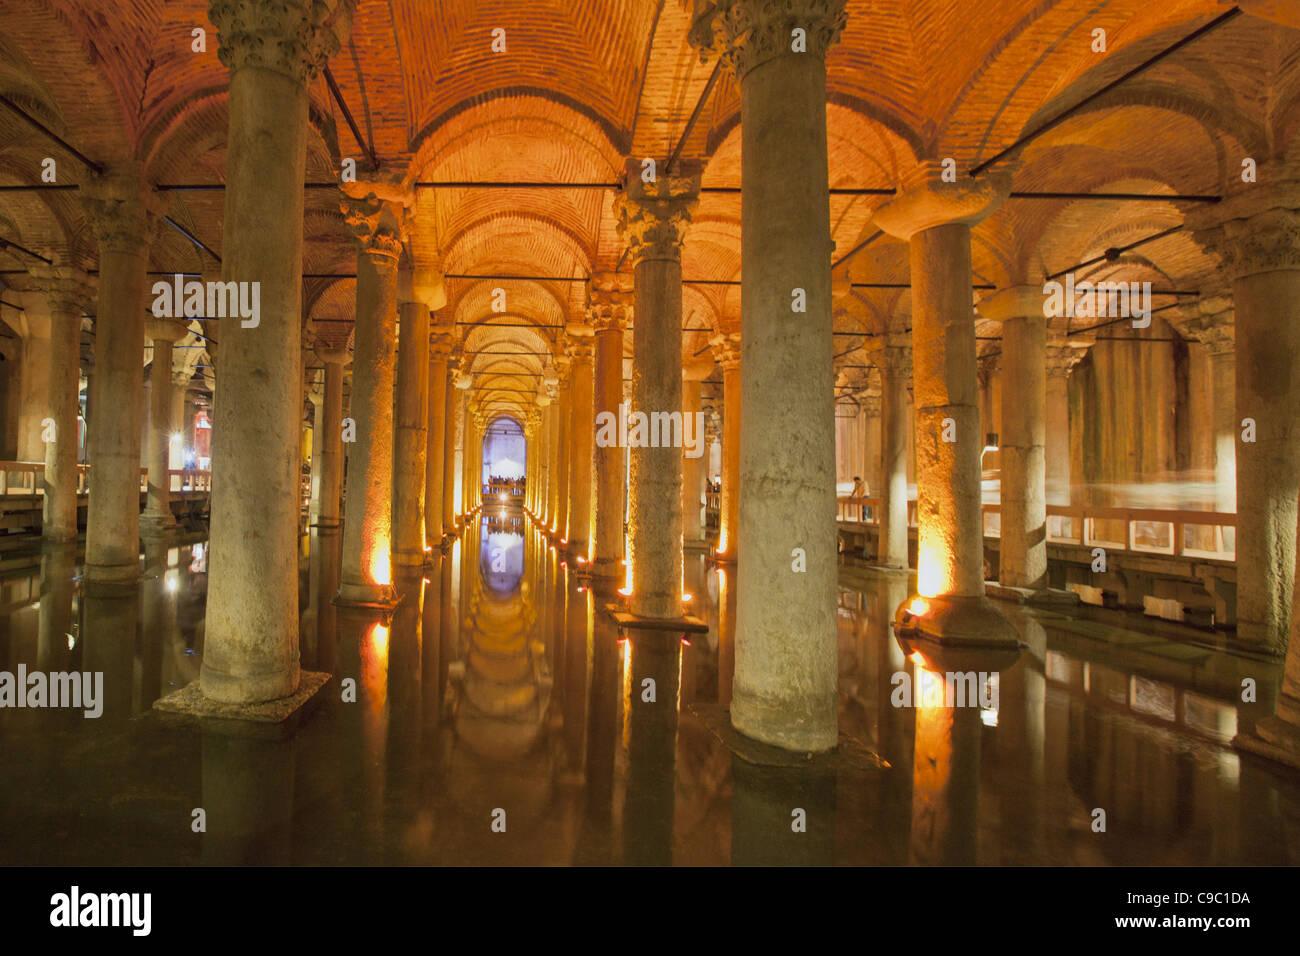 Yerebatan Sarnici , Sunken Palace Cistern, Istanbul, Turkey , Europe, - Stock Image